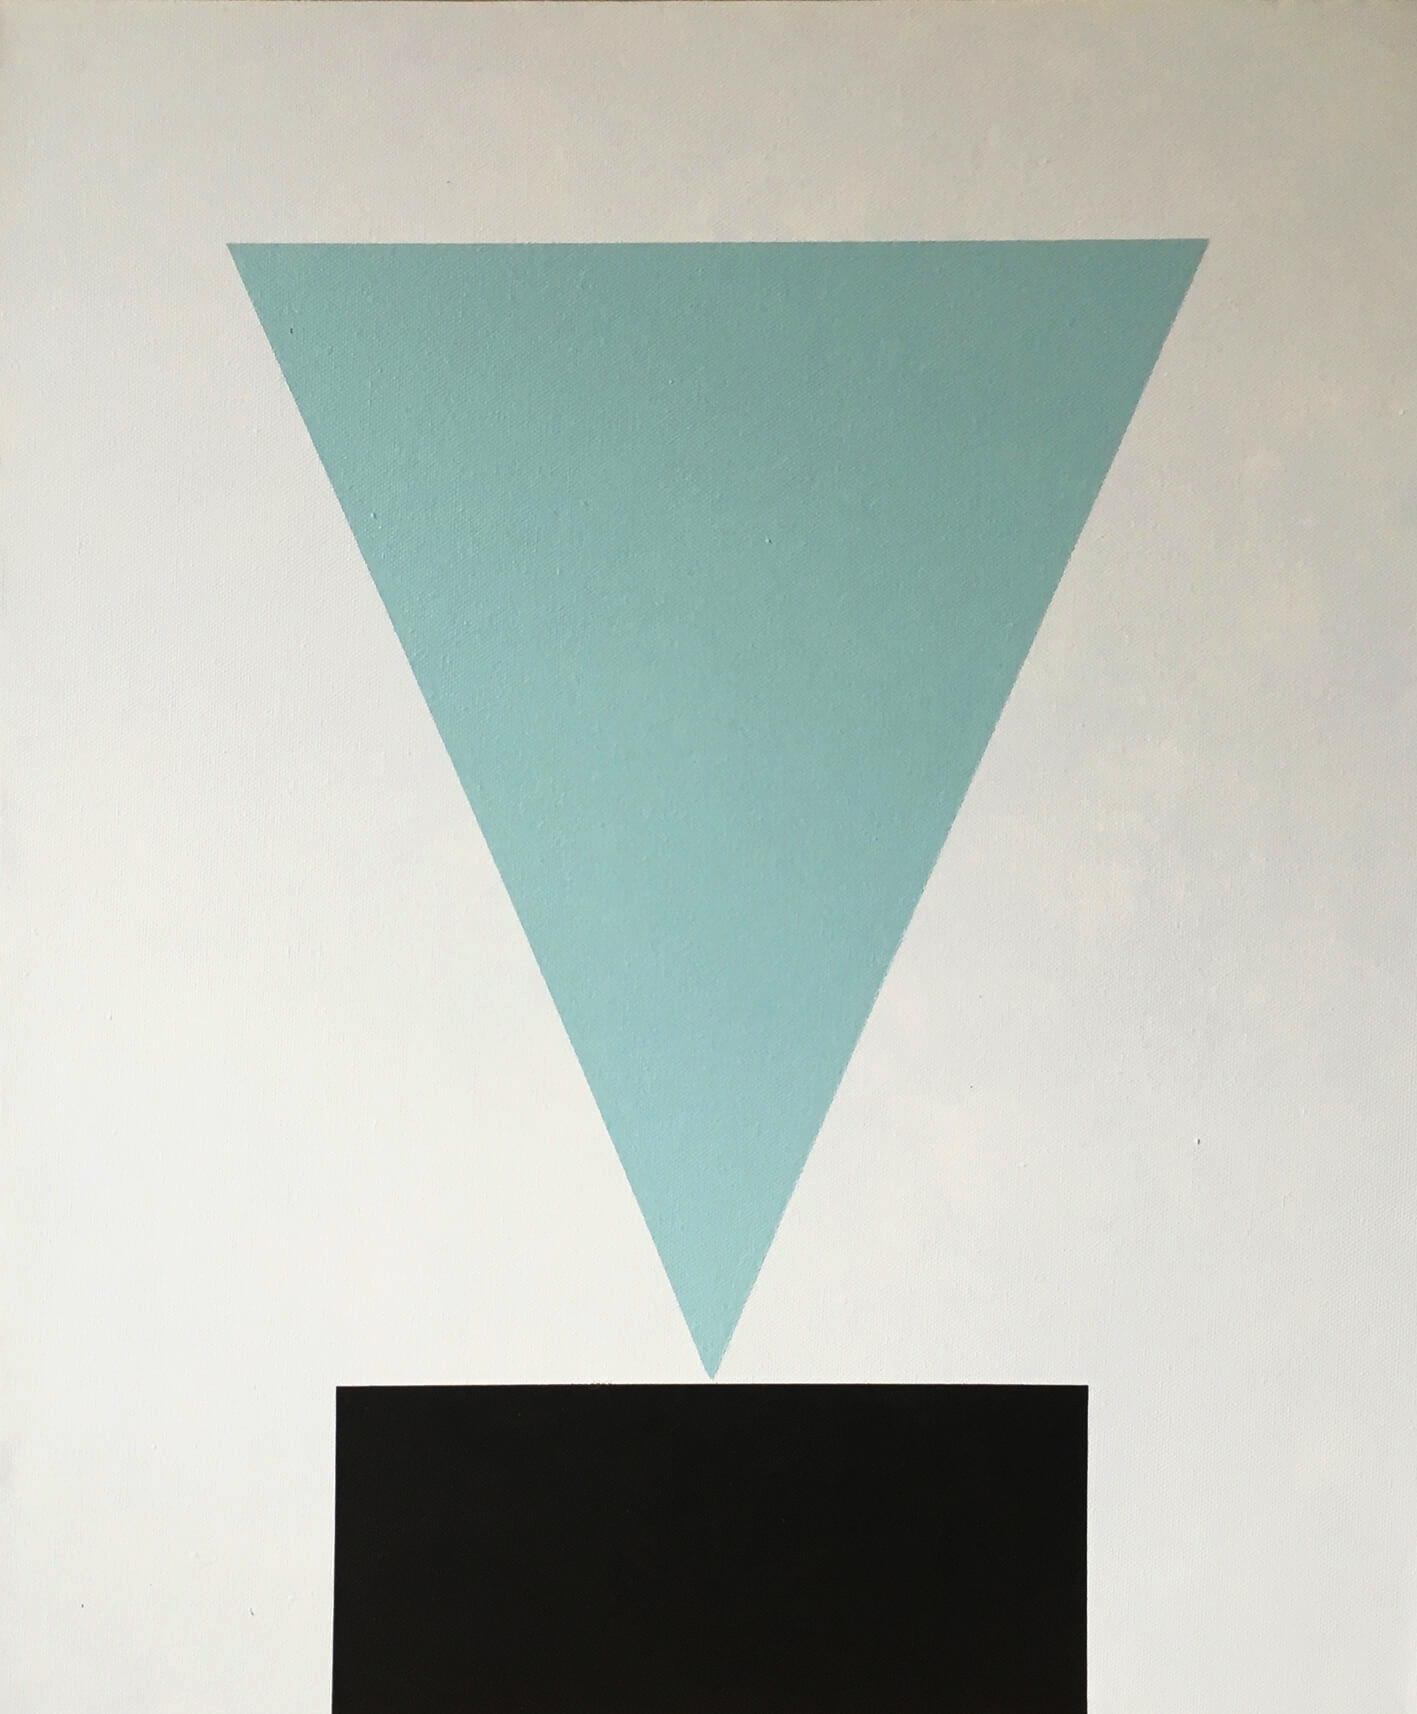 Minimal 12, 60 cm x 50 x 4 cm, Acryl auf Leinwand, Ute Latzke, 2016, 500,- Euro.